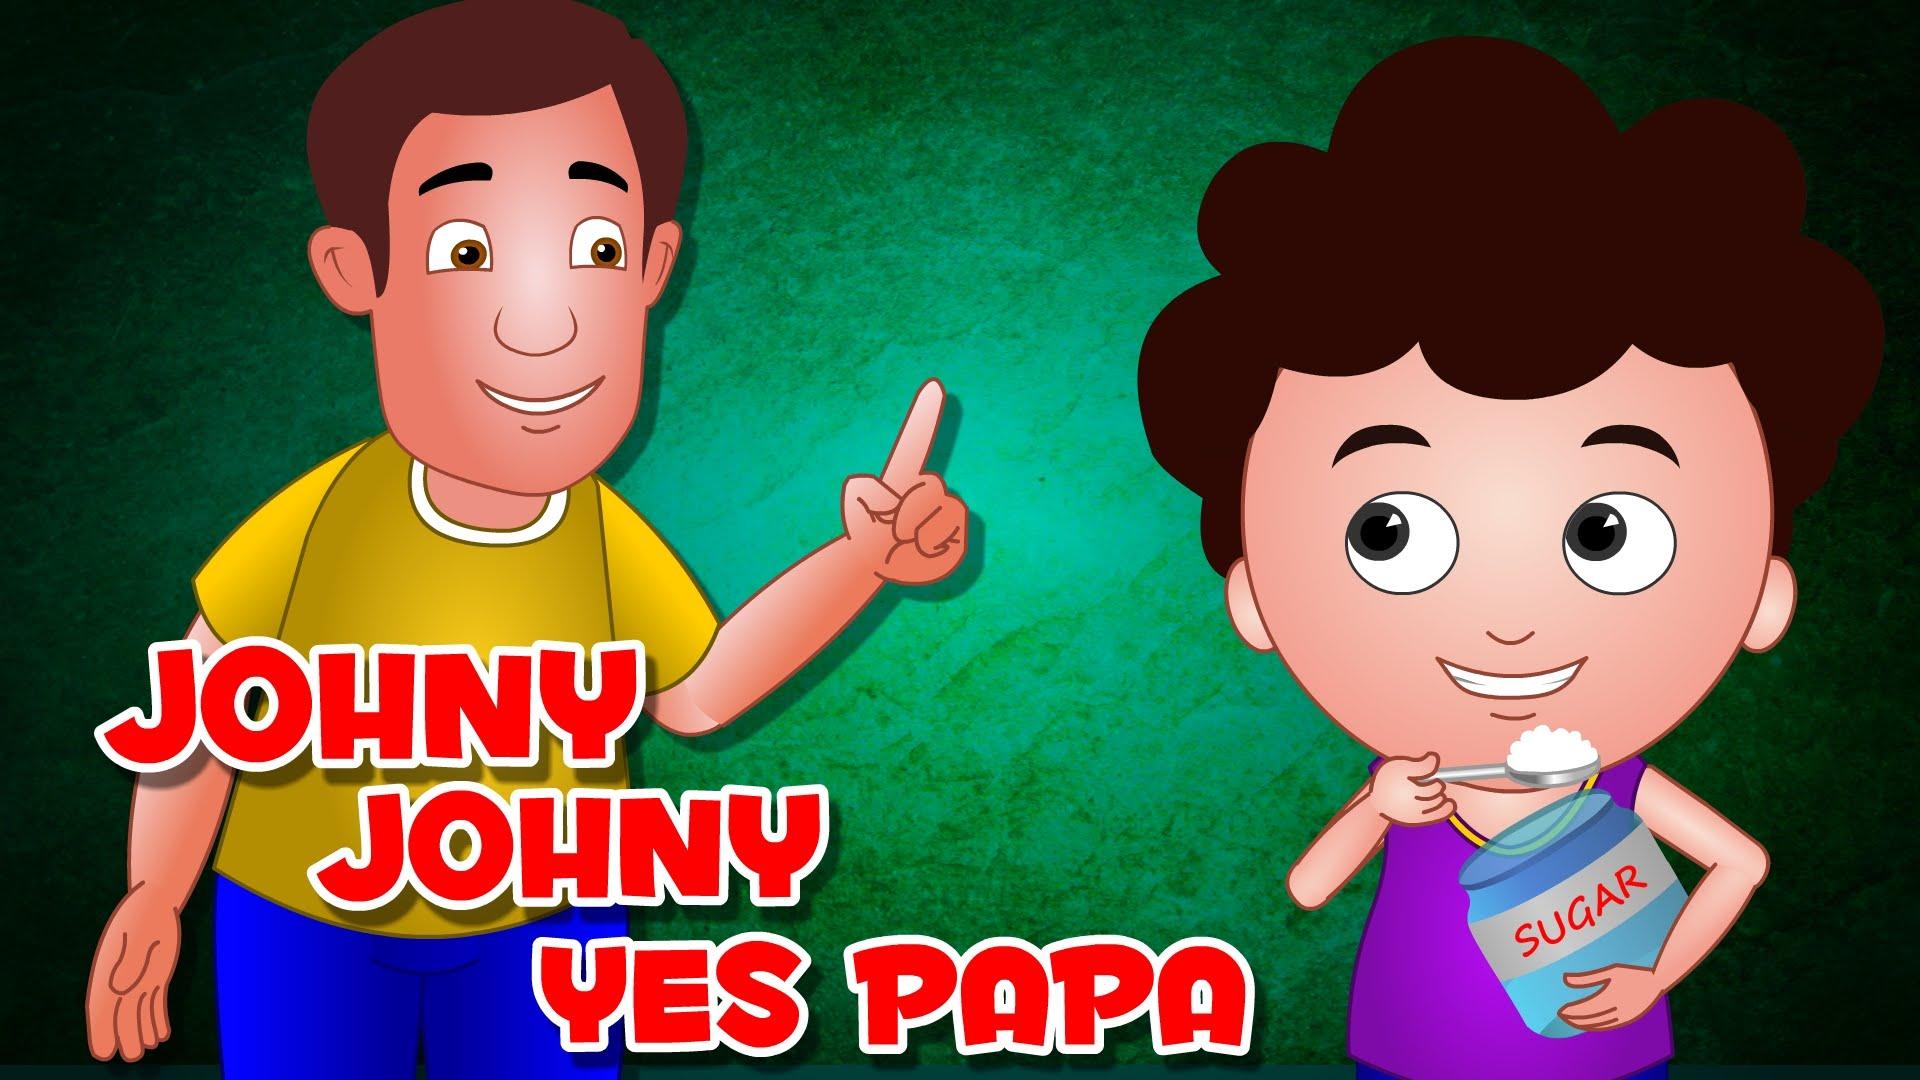 Johny Johny Yes Papa   Nursery Rhymes with Lyrics  Cartoon Animation English Nursery rhyme